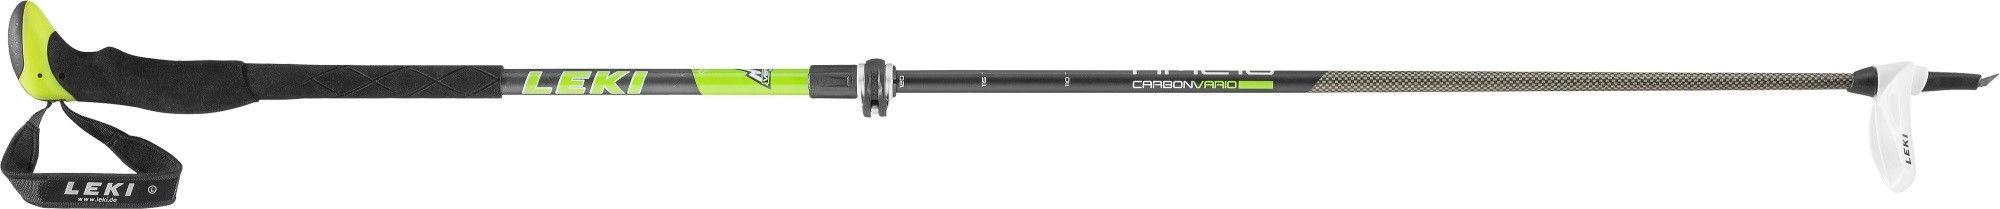 Leki Tour Carbon 2 | Größe 105 - 150 cm |  Ski- & Tourenstock